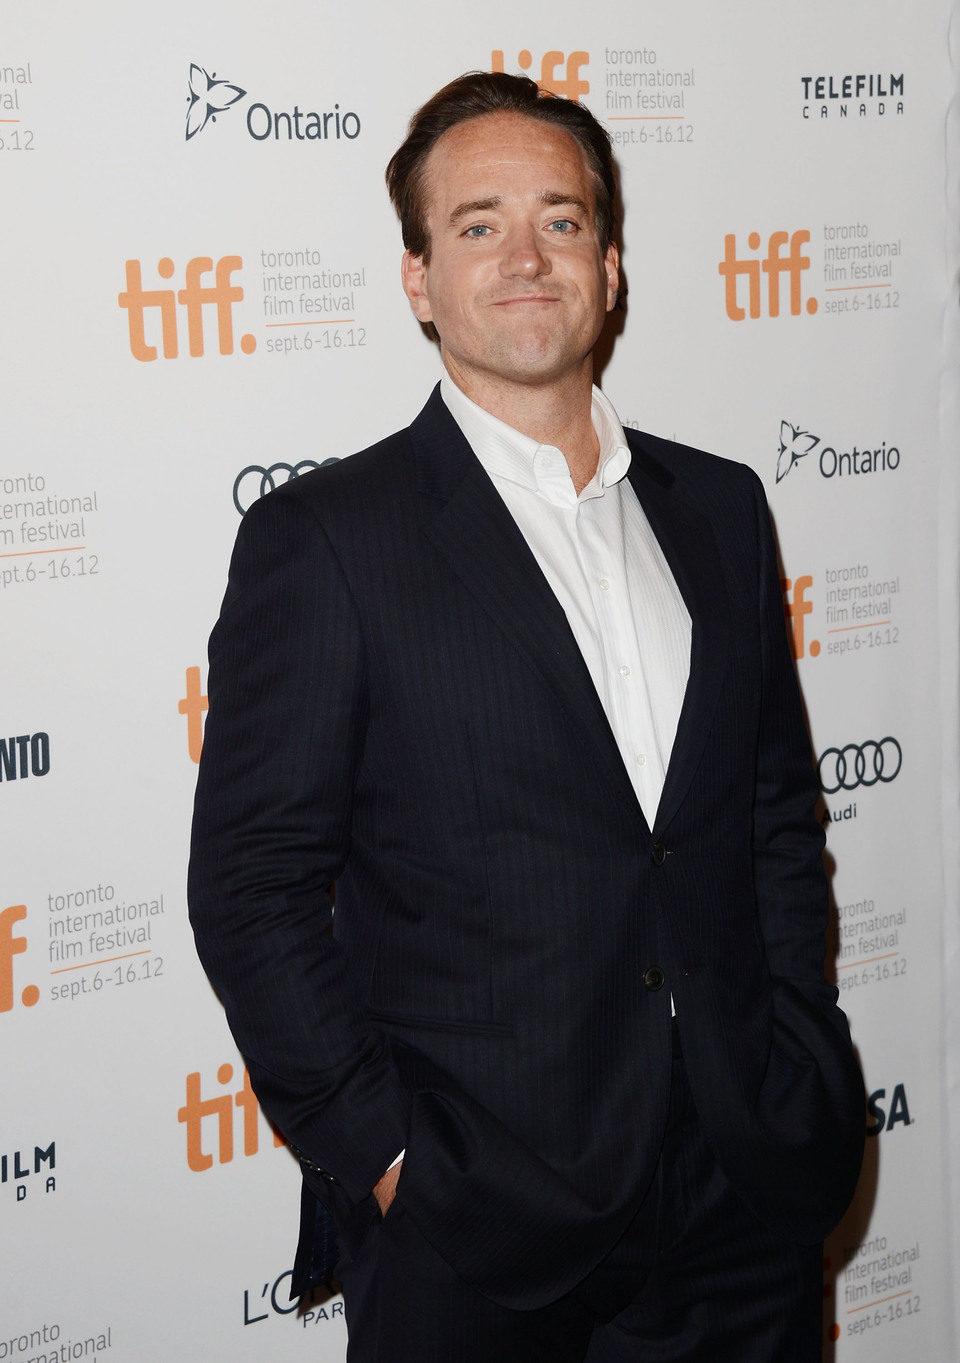 Matthew MacFadyen en el TIFF 2012